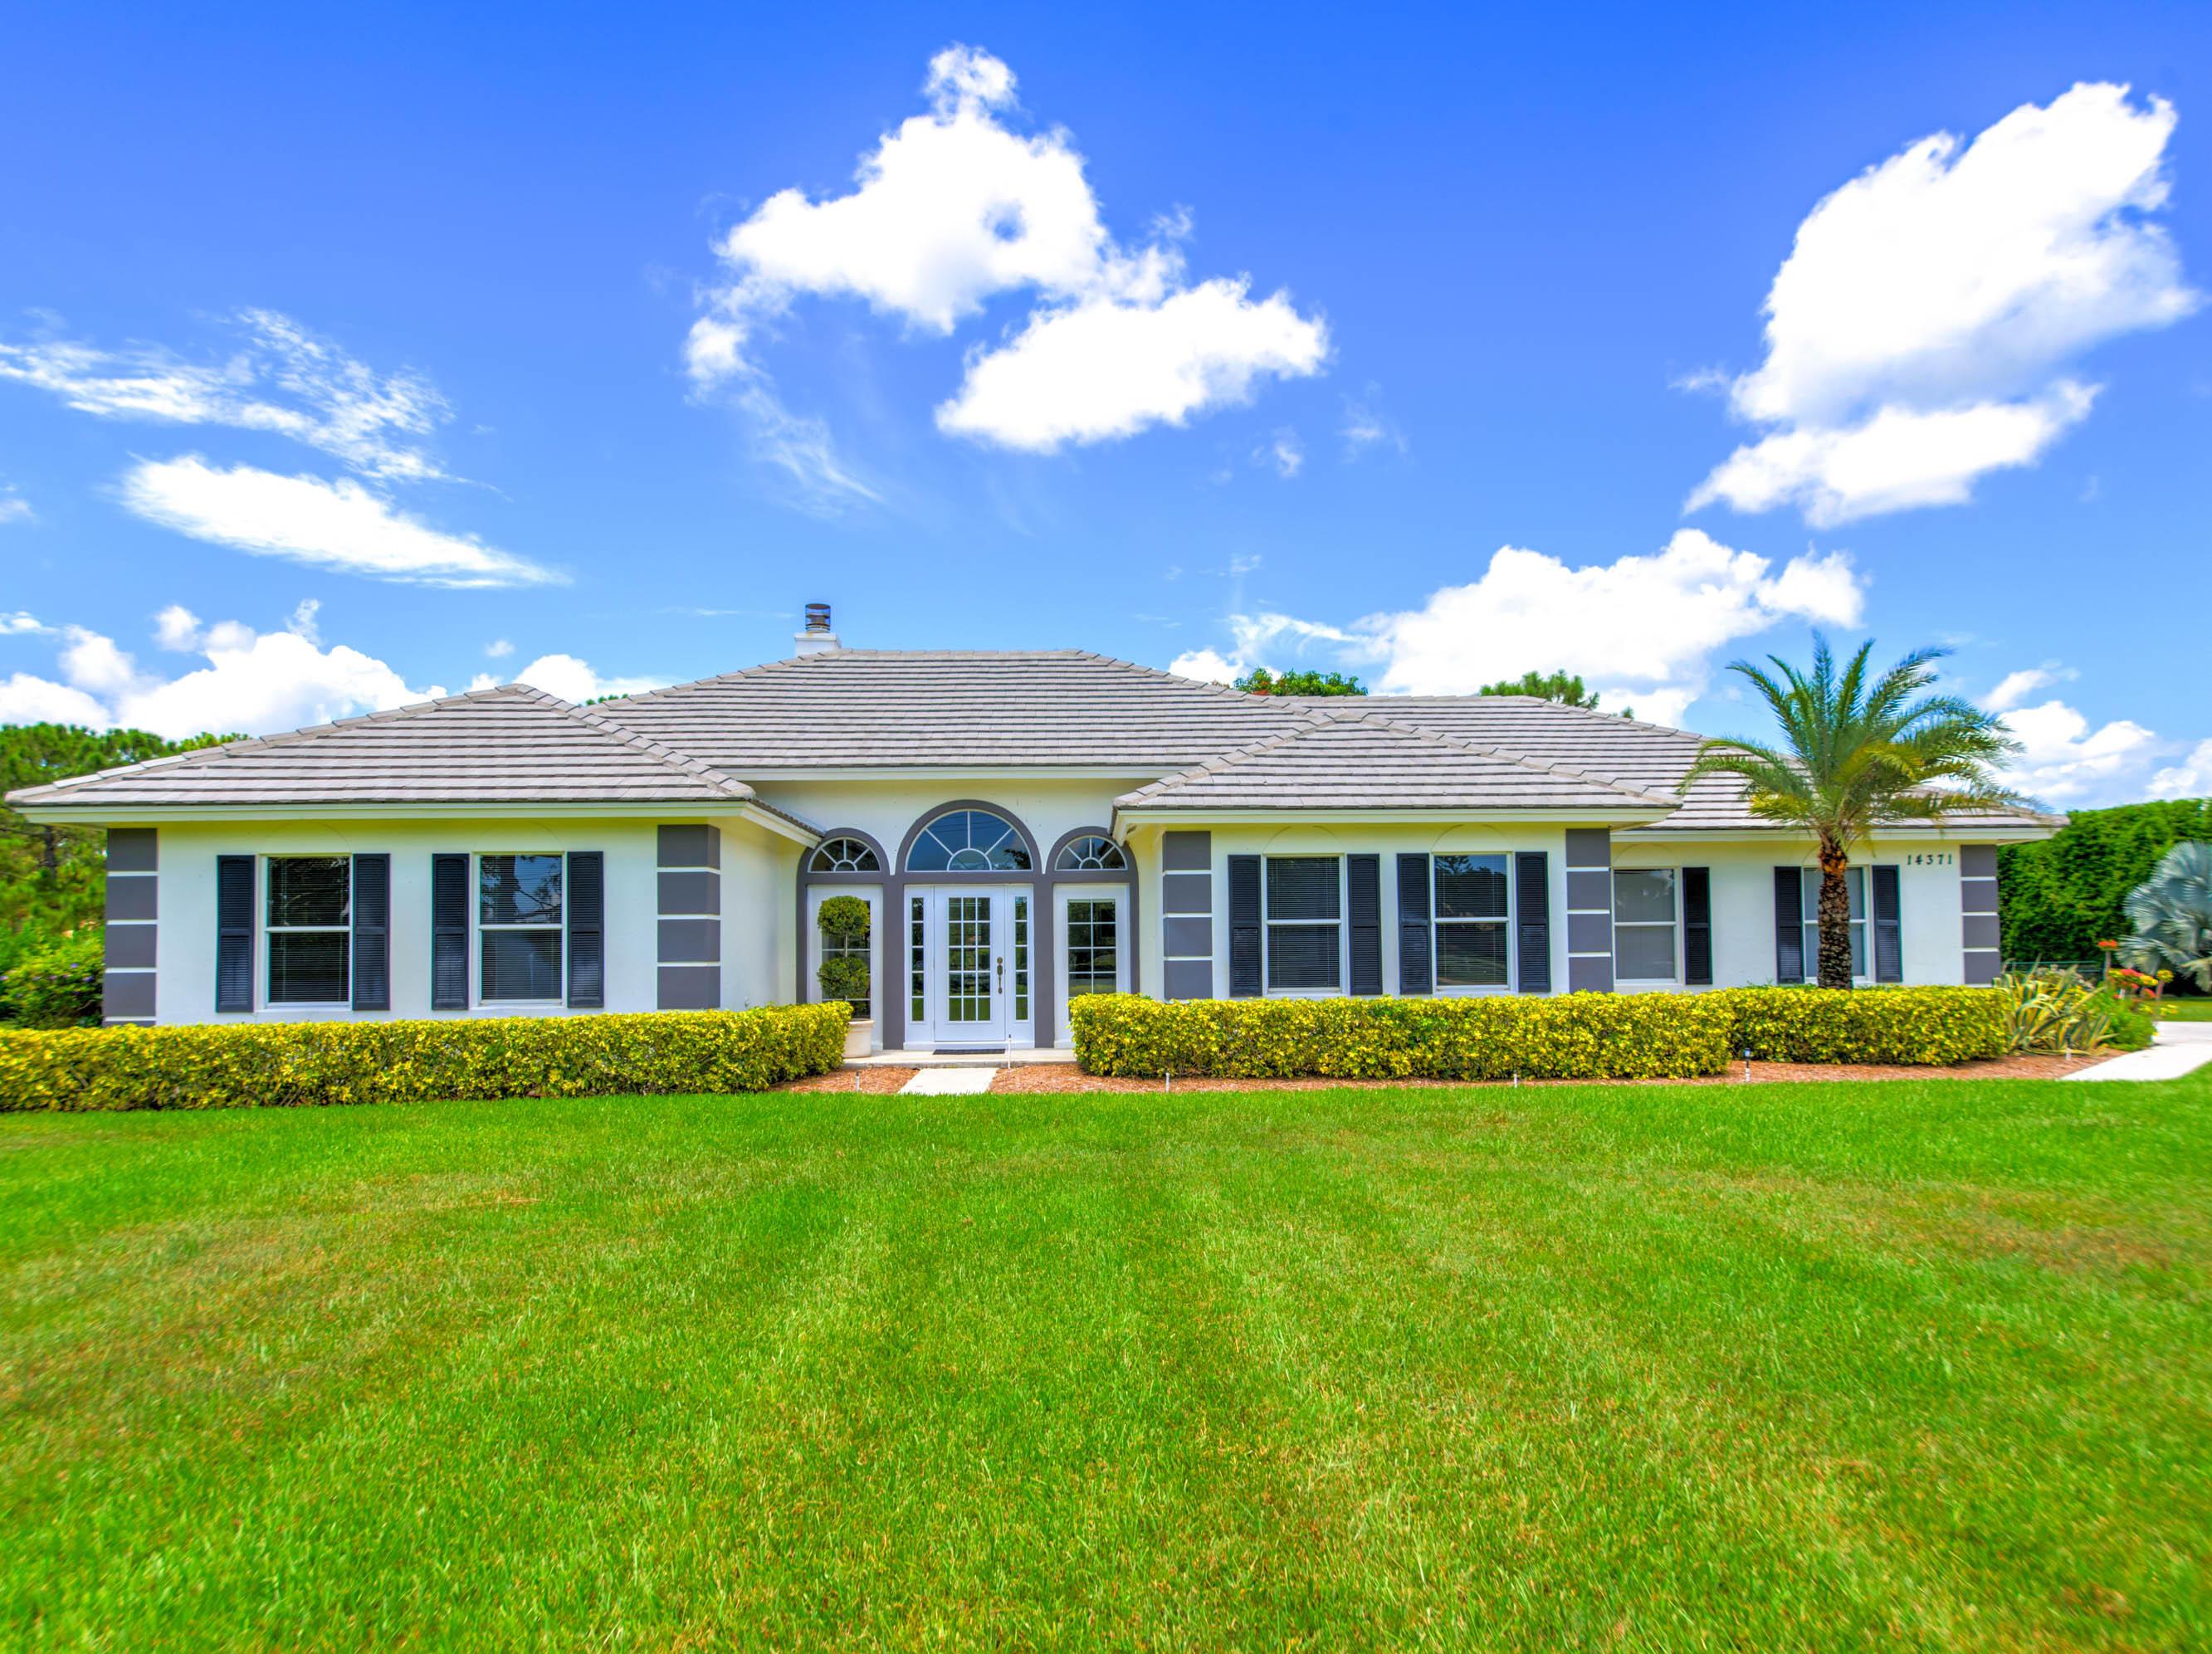 14371 Wellington Trace, Wellington, Florida 33414, 4 Bedrooms Bedrooms, ,2.1 BathroomsBathrooms,Single Family,For Rent,PADDOCK PARK 2 OF WELLINGTON,Wellington,RX-10483602